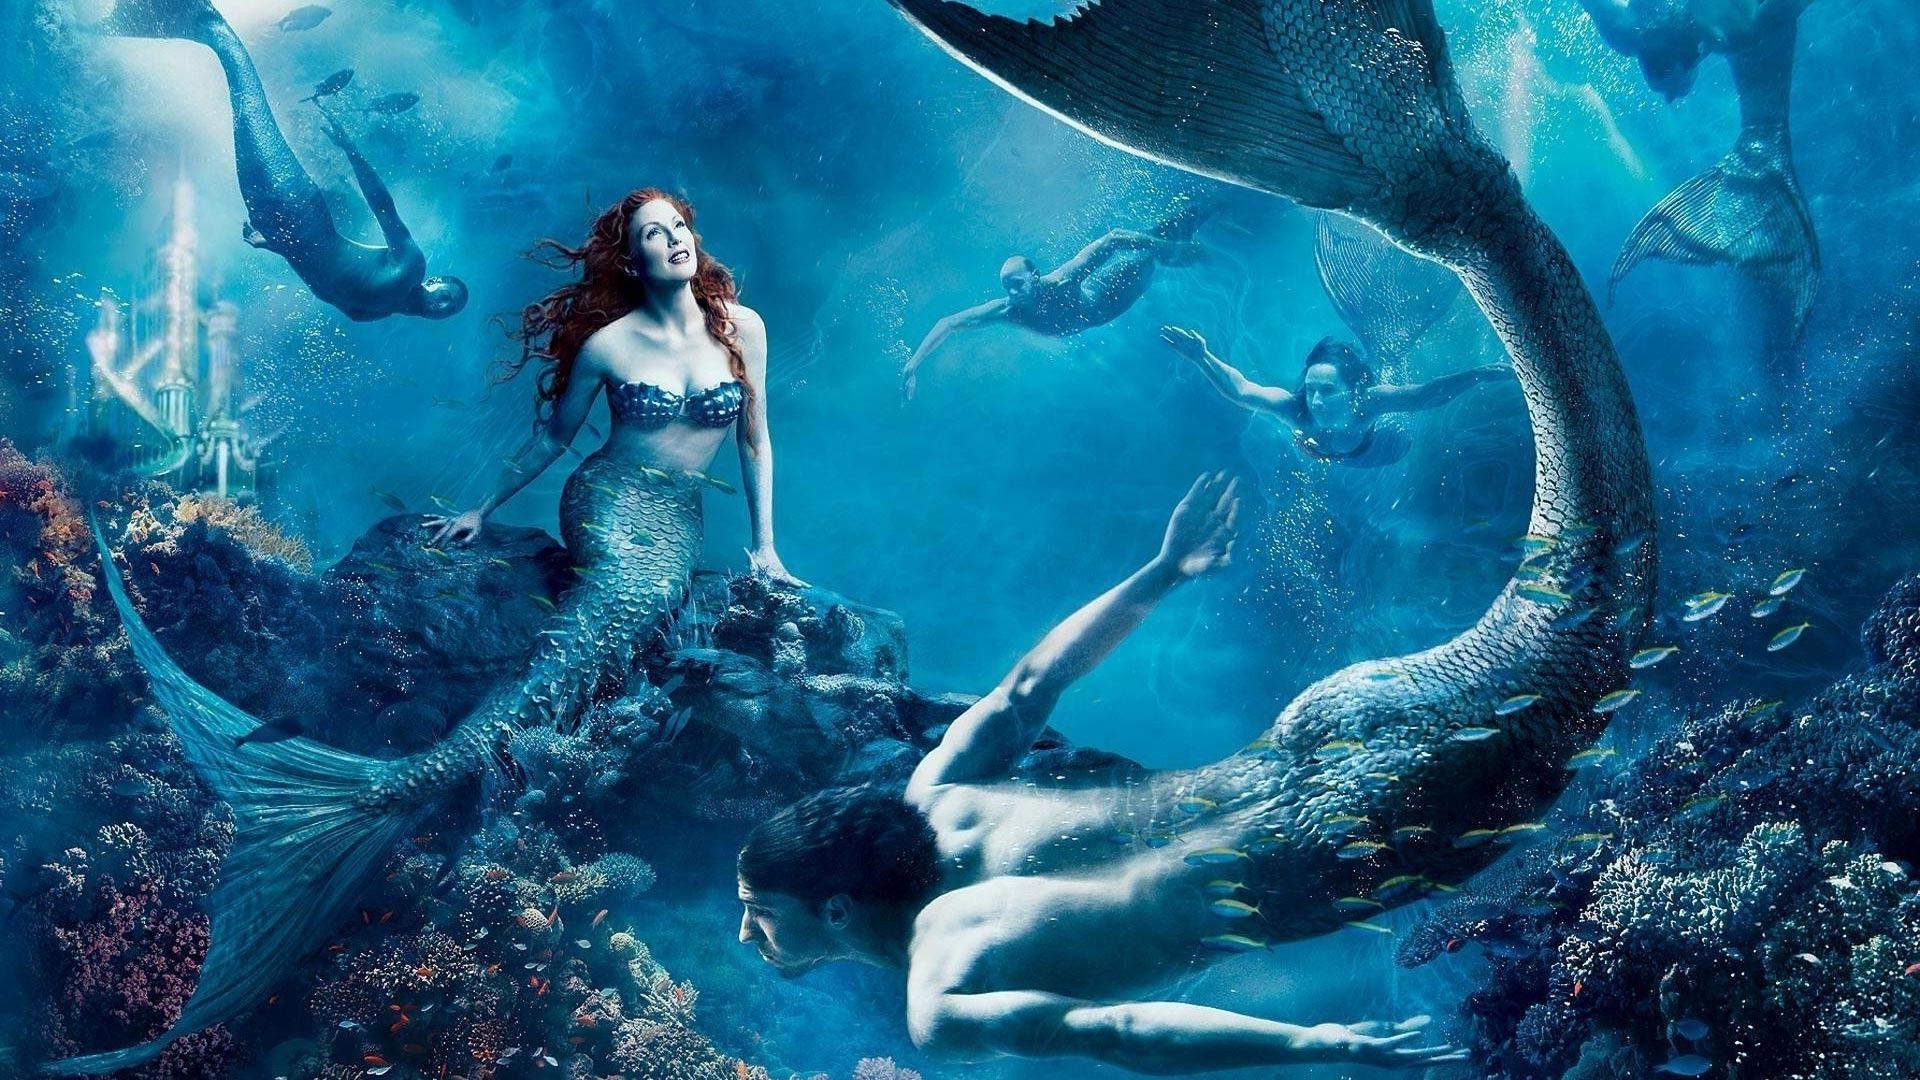 Cool Mermaid Screensavers